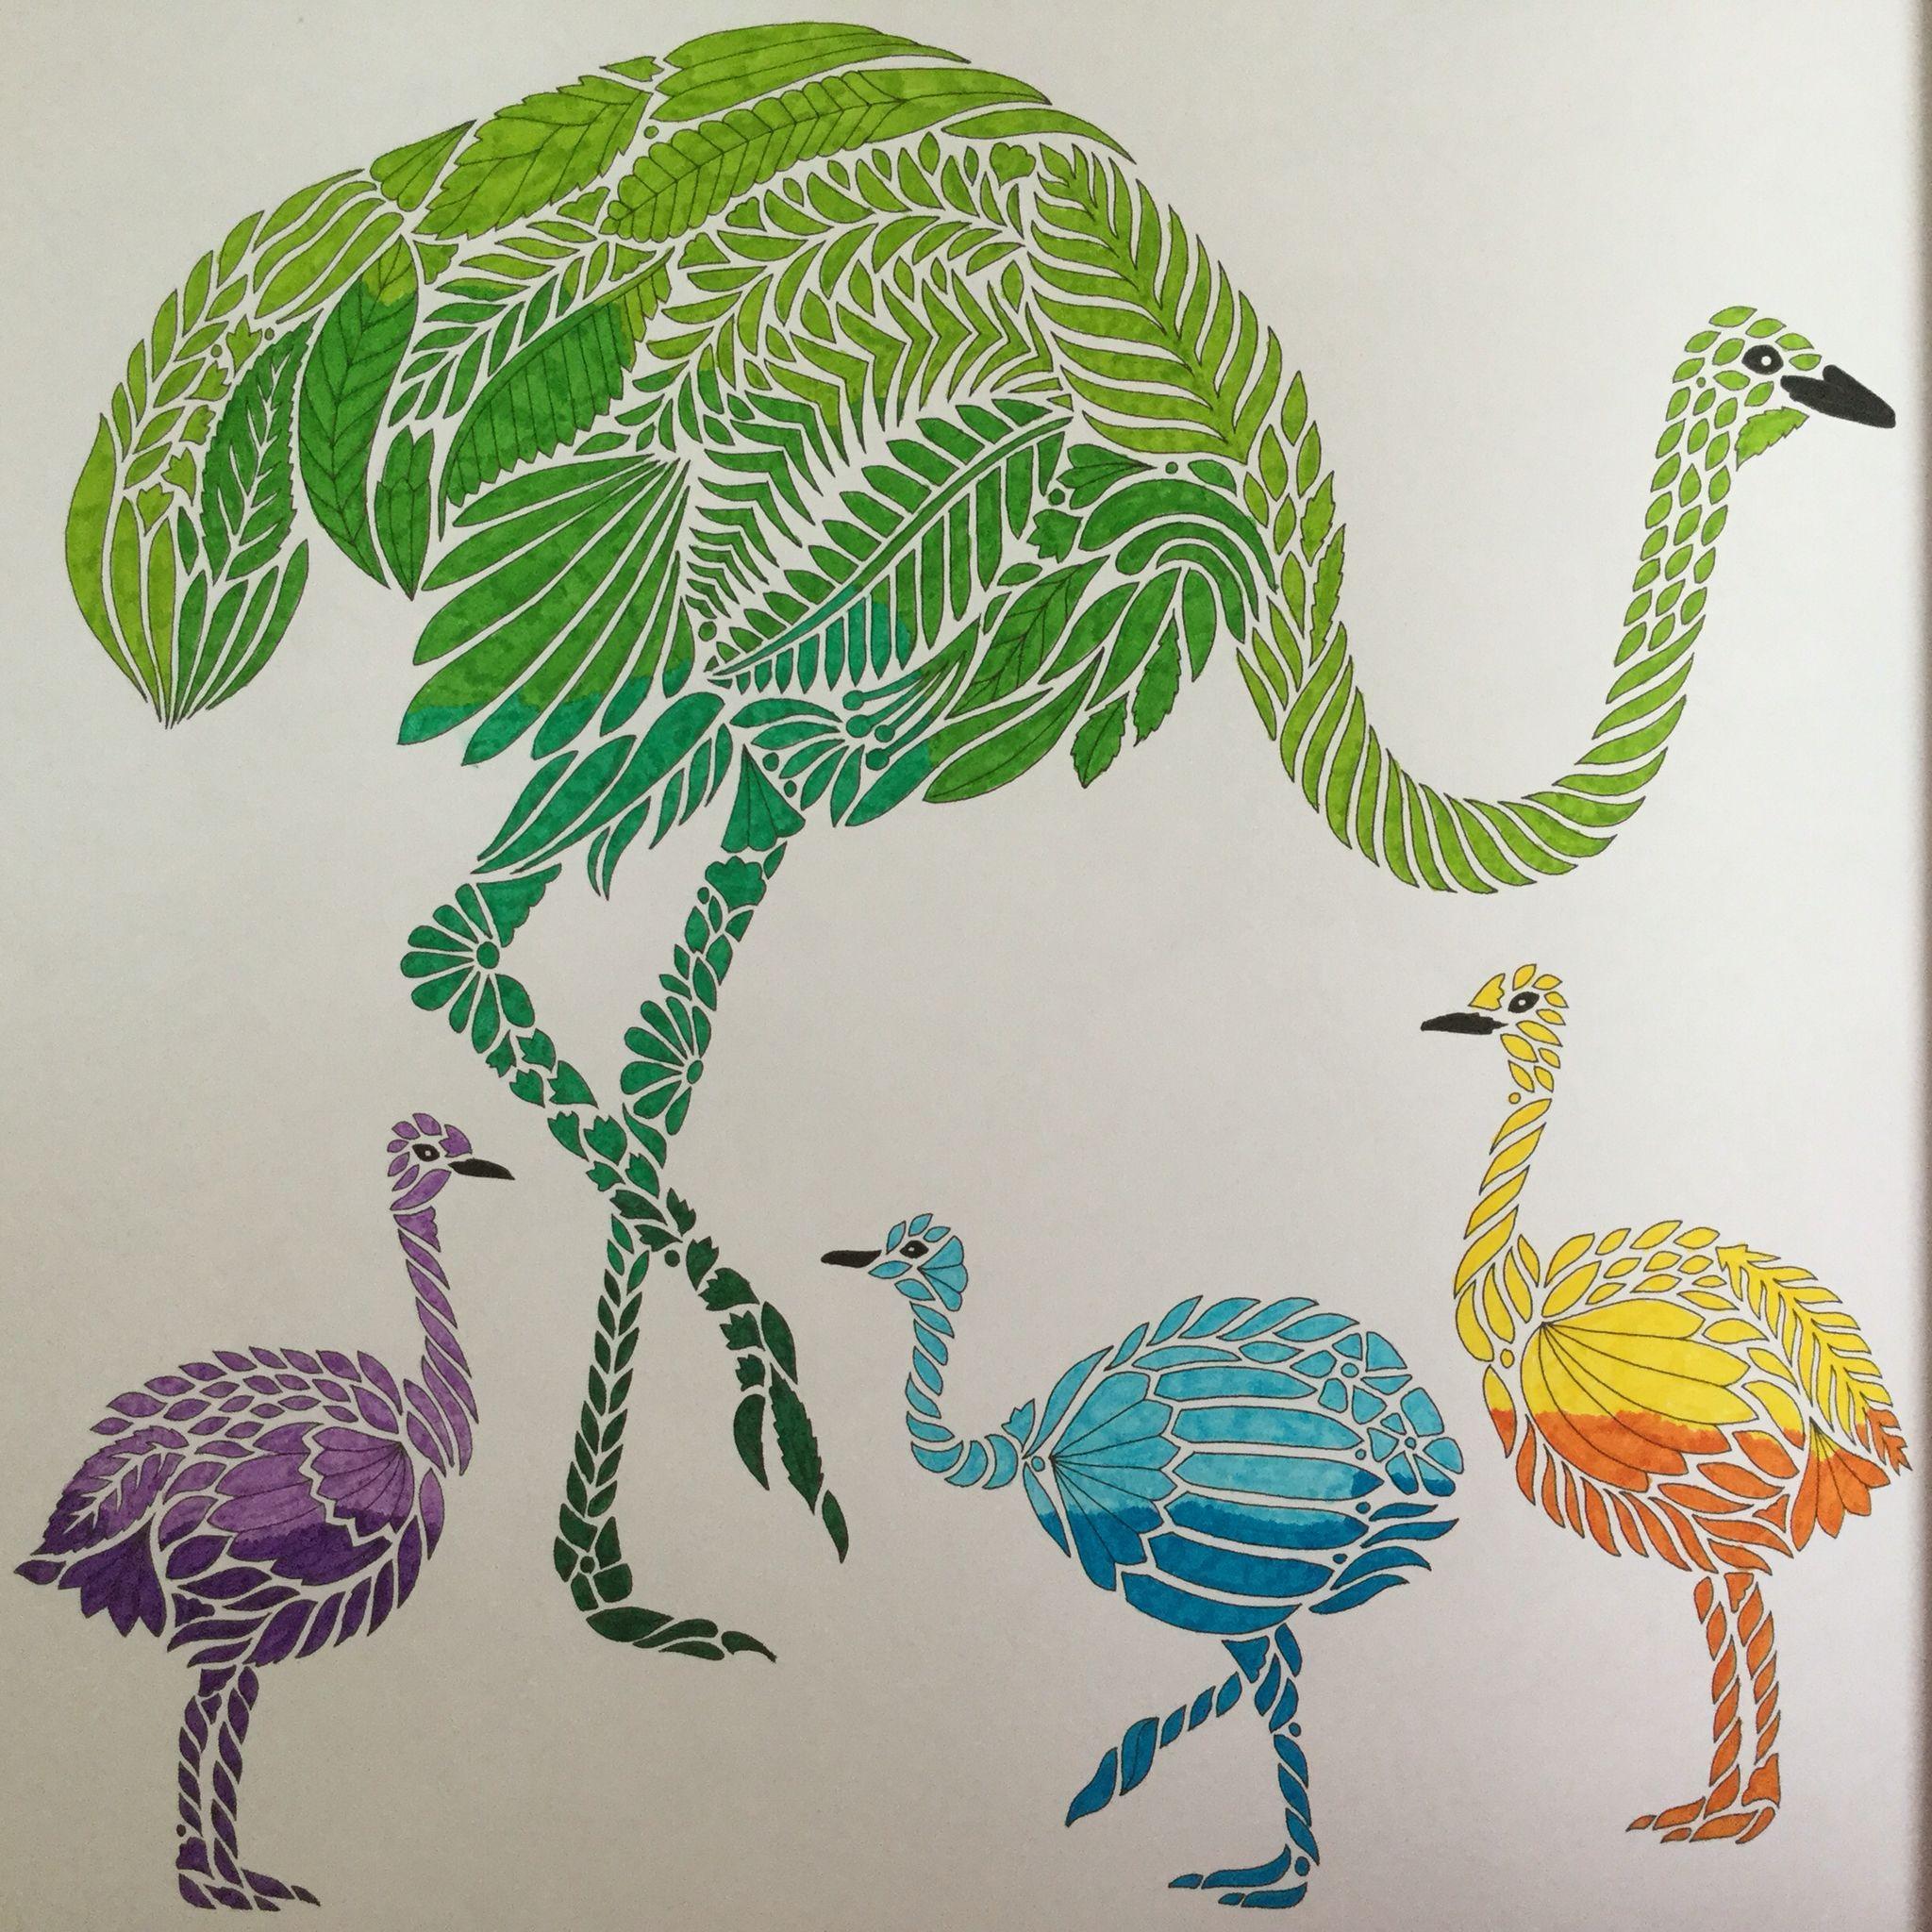 Emu Family Wild Savannah Book Millie Marotta Millie Marotta Coloring Book Millie